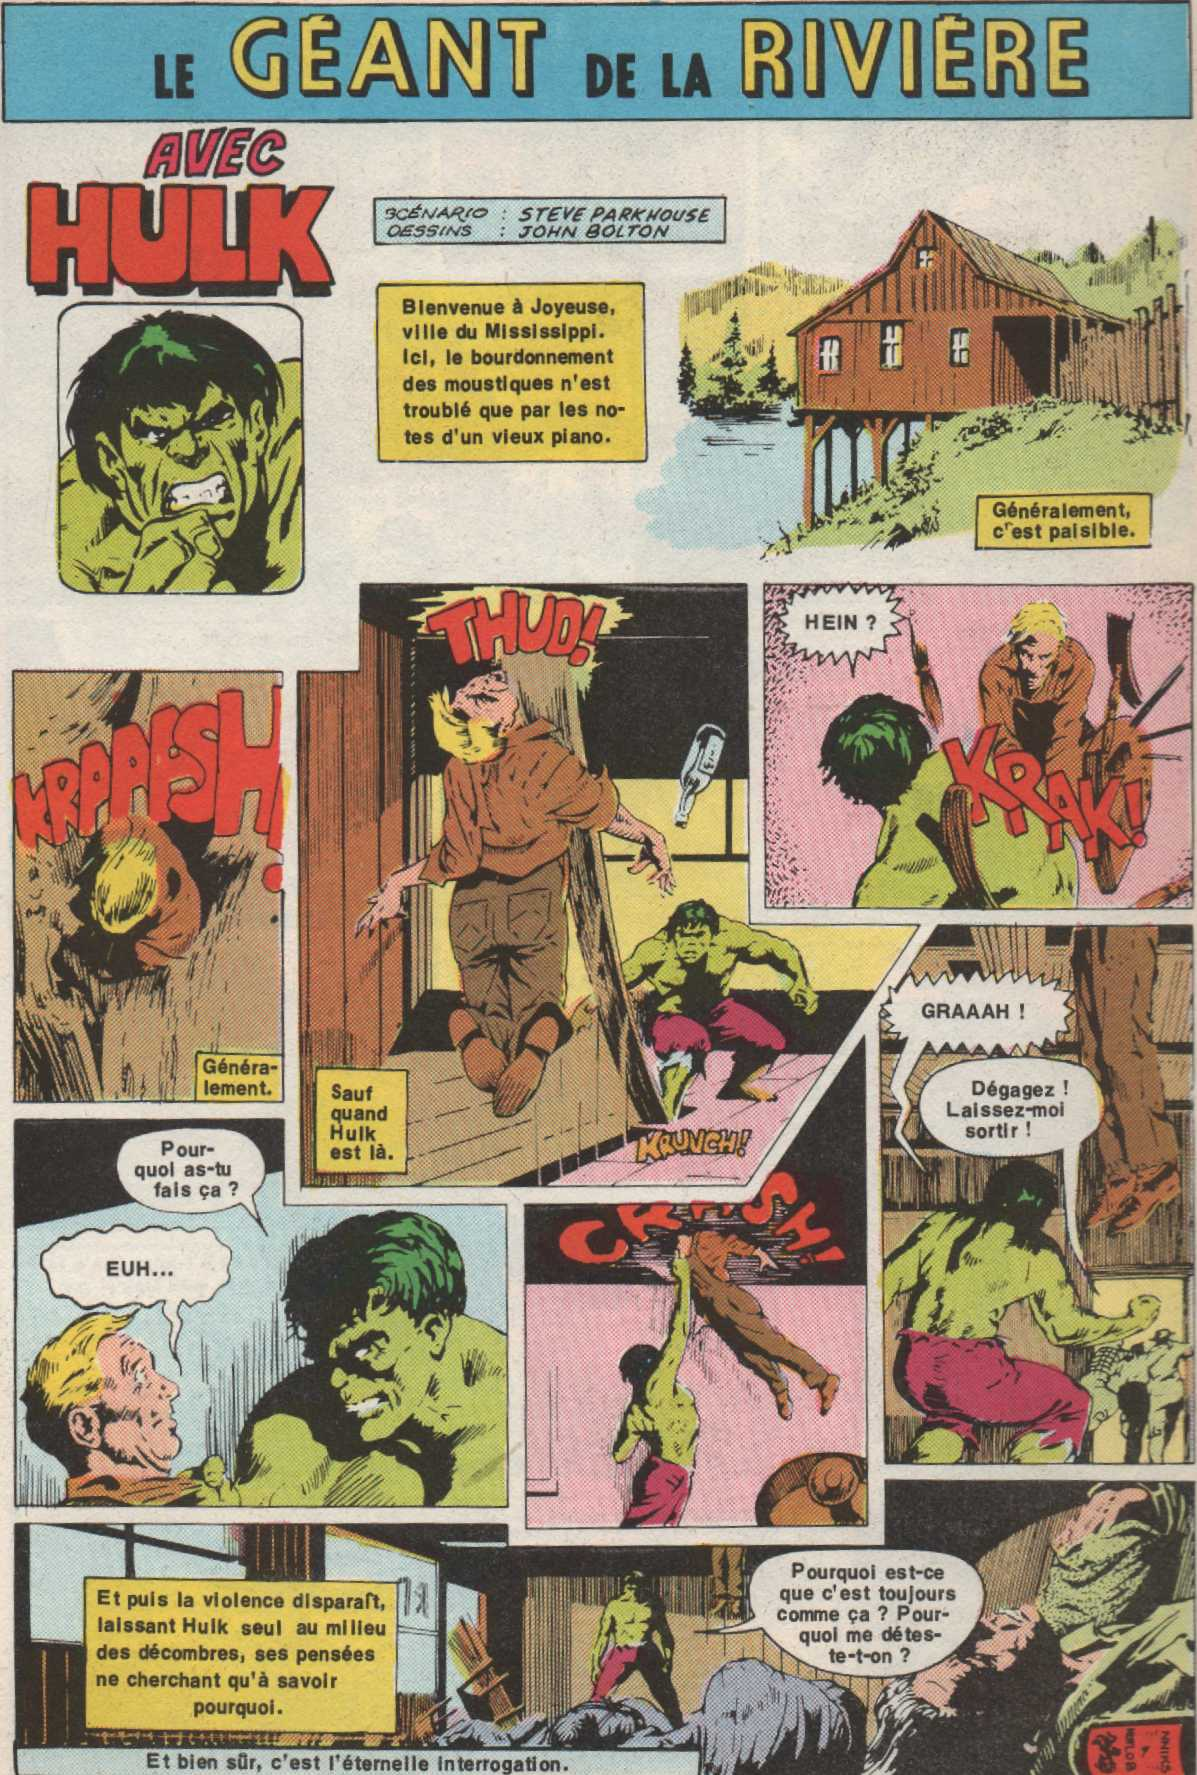 Bolton John Hulk